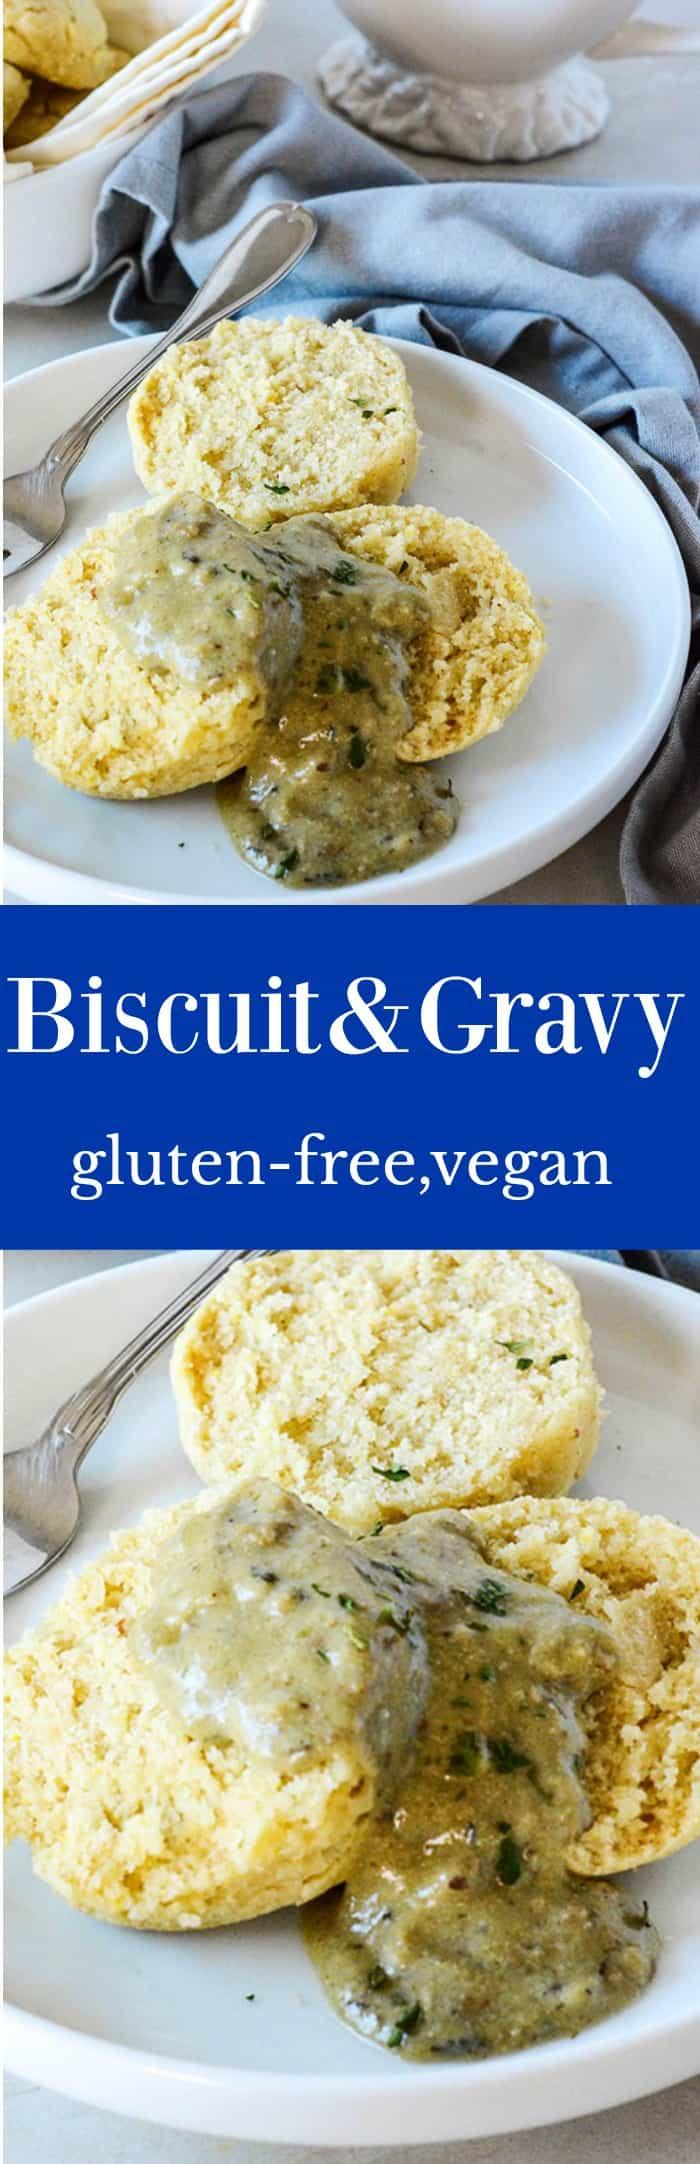 Biscuit And Gravy (Gluten-Free, Vegan)